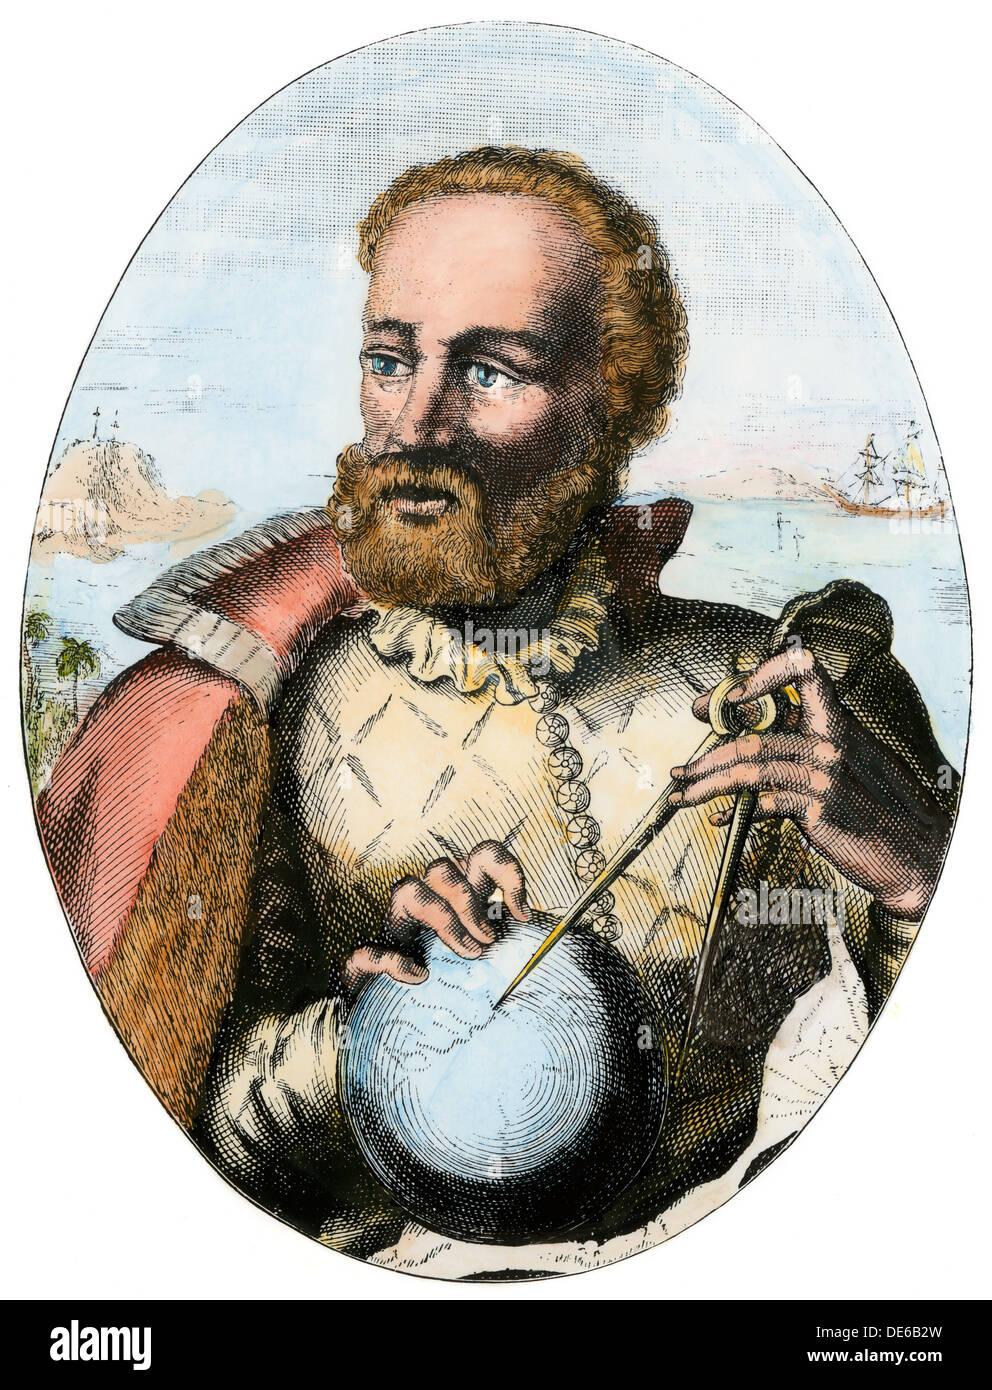 Portuguese explorer Ferdinand Magellan holding navigation instruments. Hand-colored woodcut - Stock Image